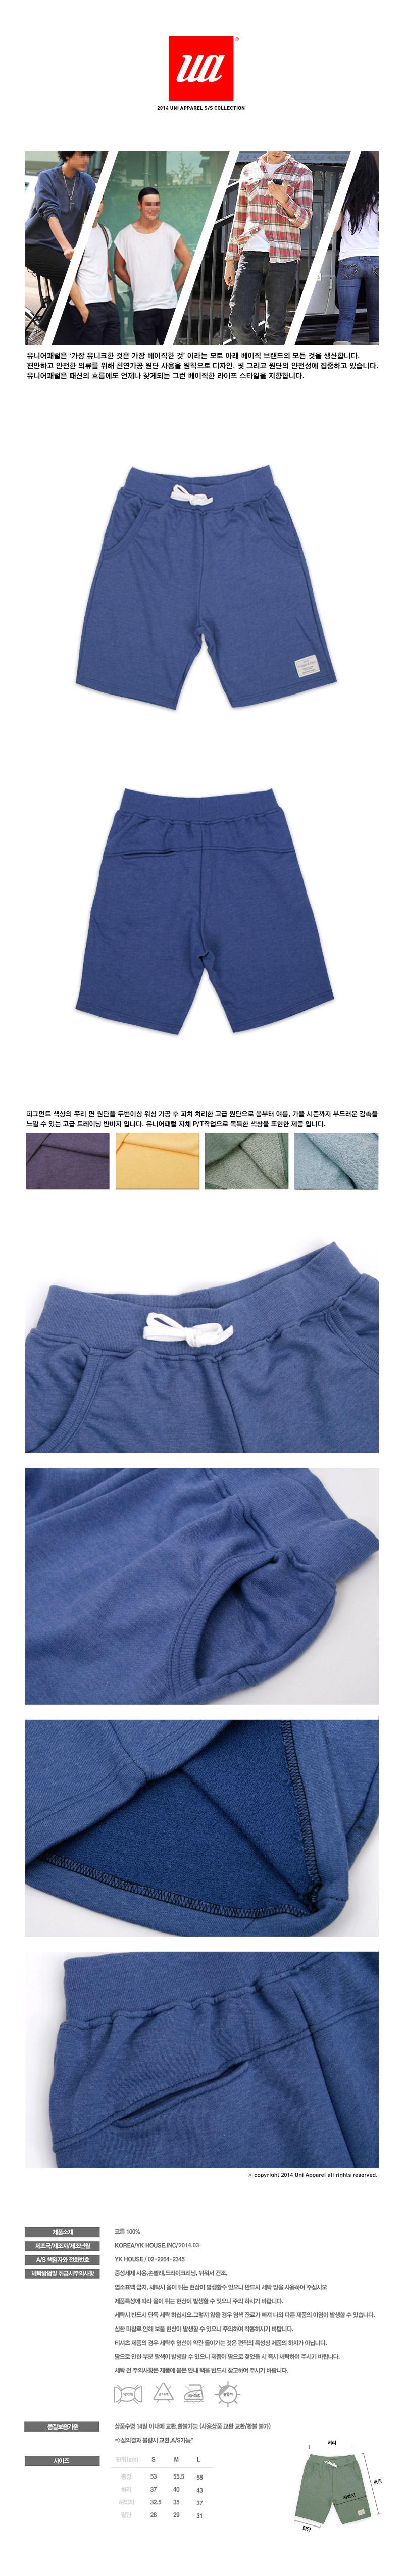 basic-pigment-short-pants-(washingblue).jpg